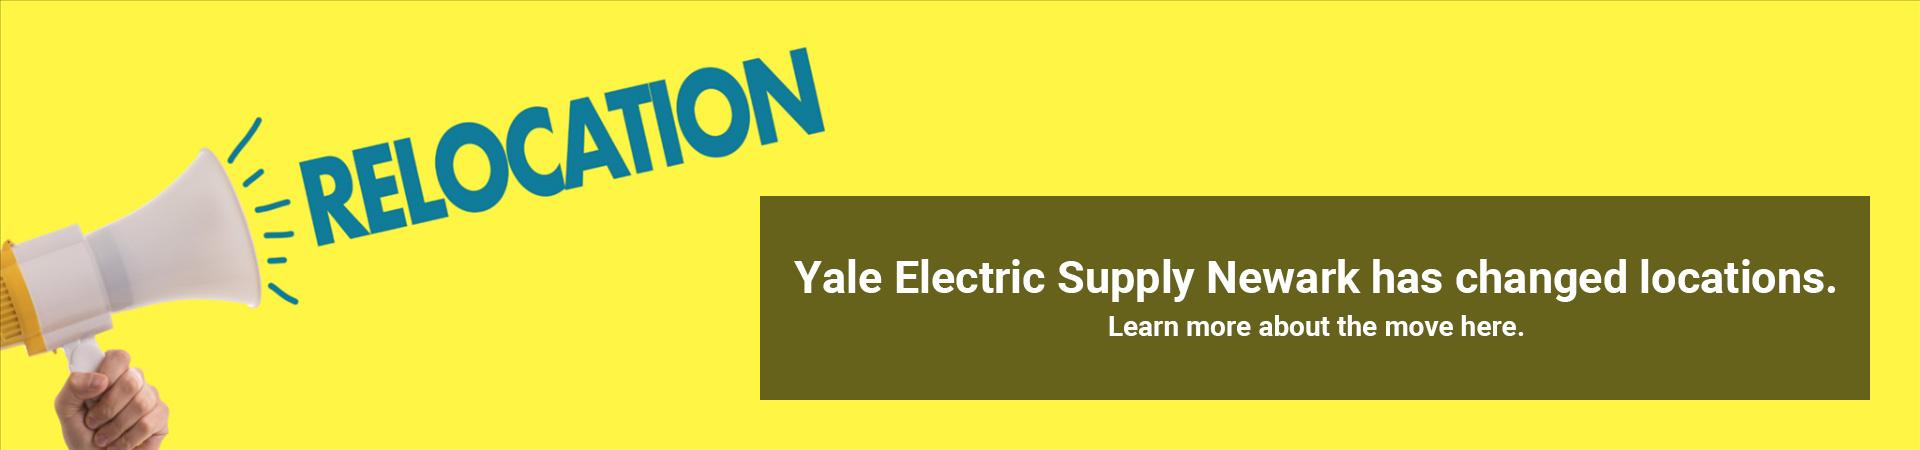 yale electric supply company yale electric supply rh yaleelectricsupply com